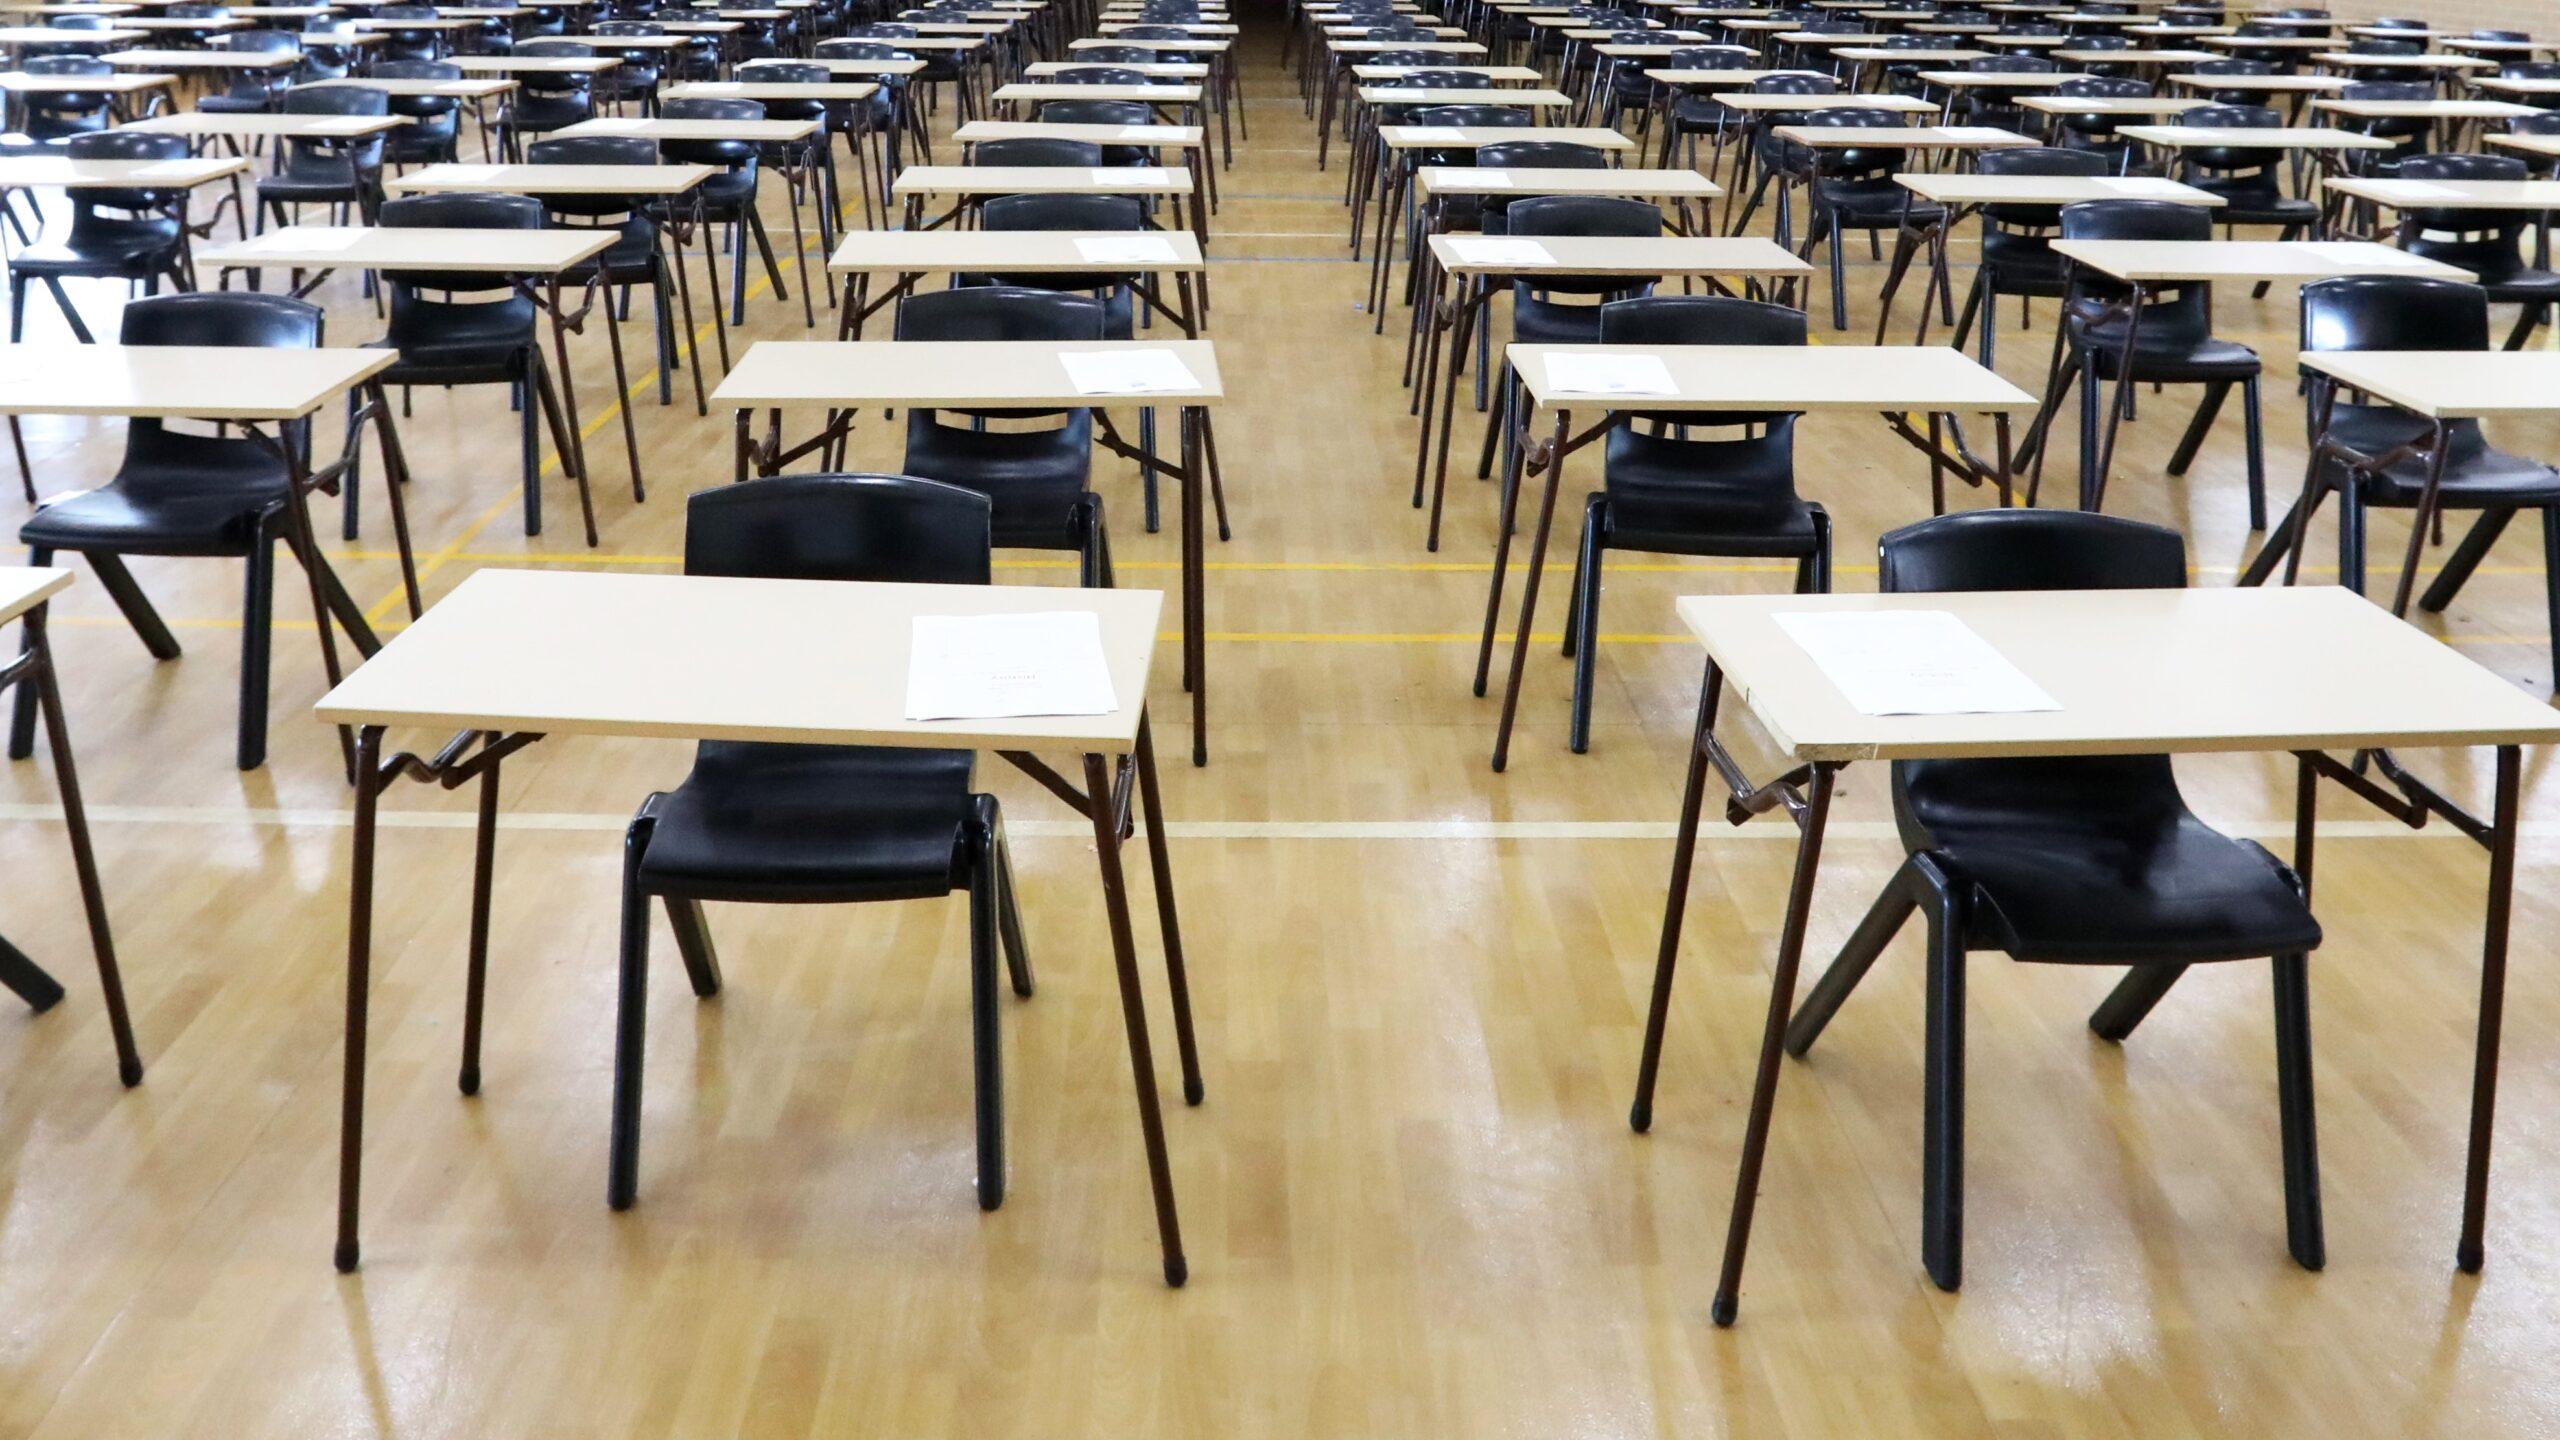 SASB revamps FSA Level 1 curriculum